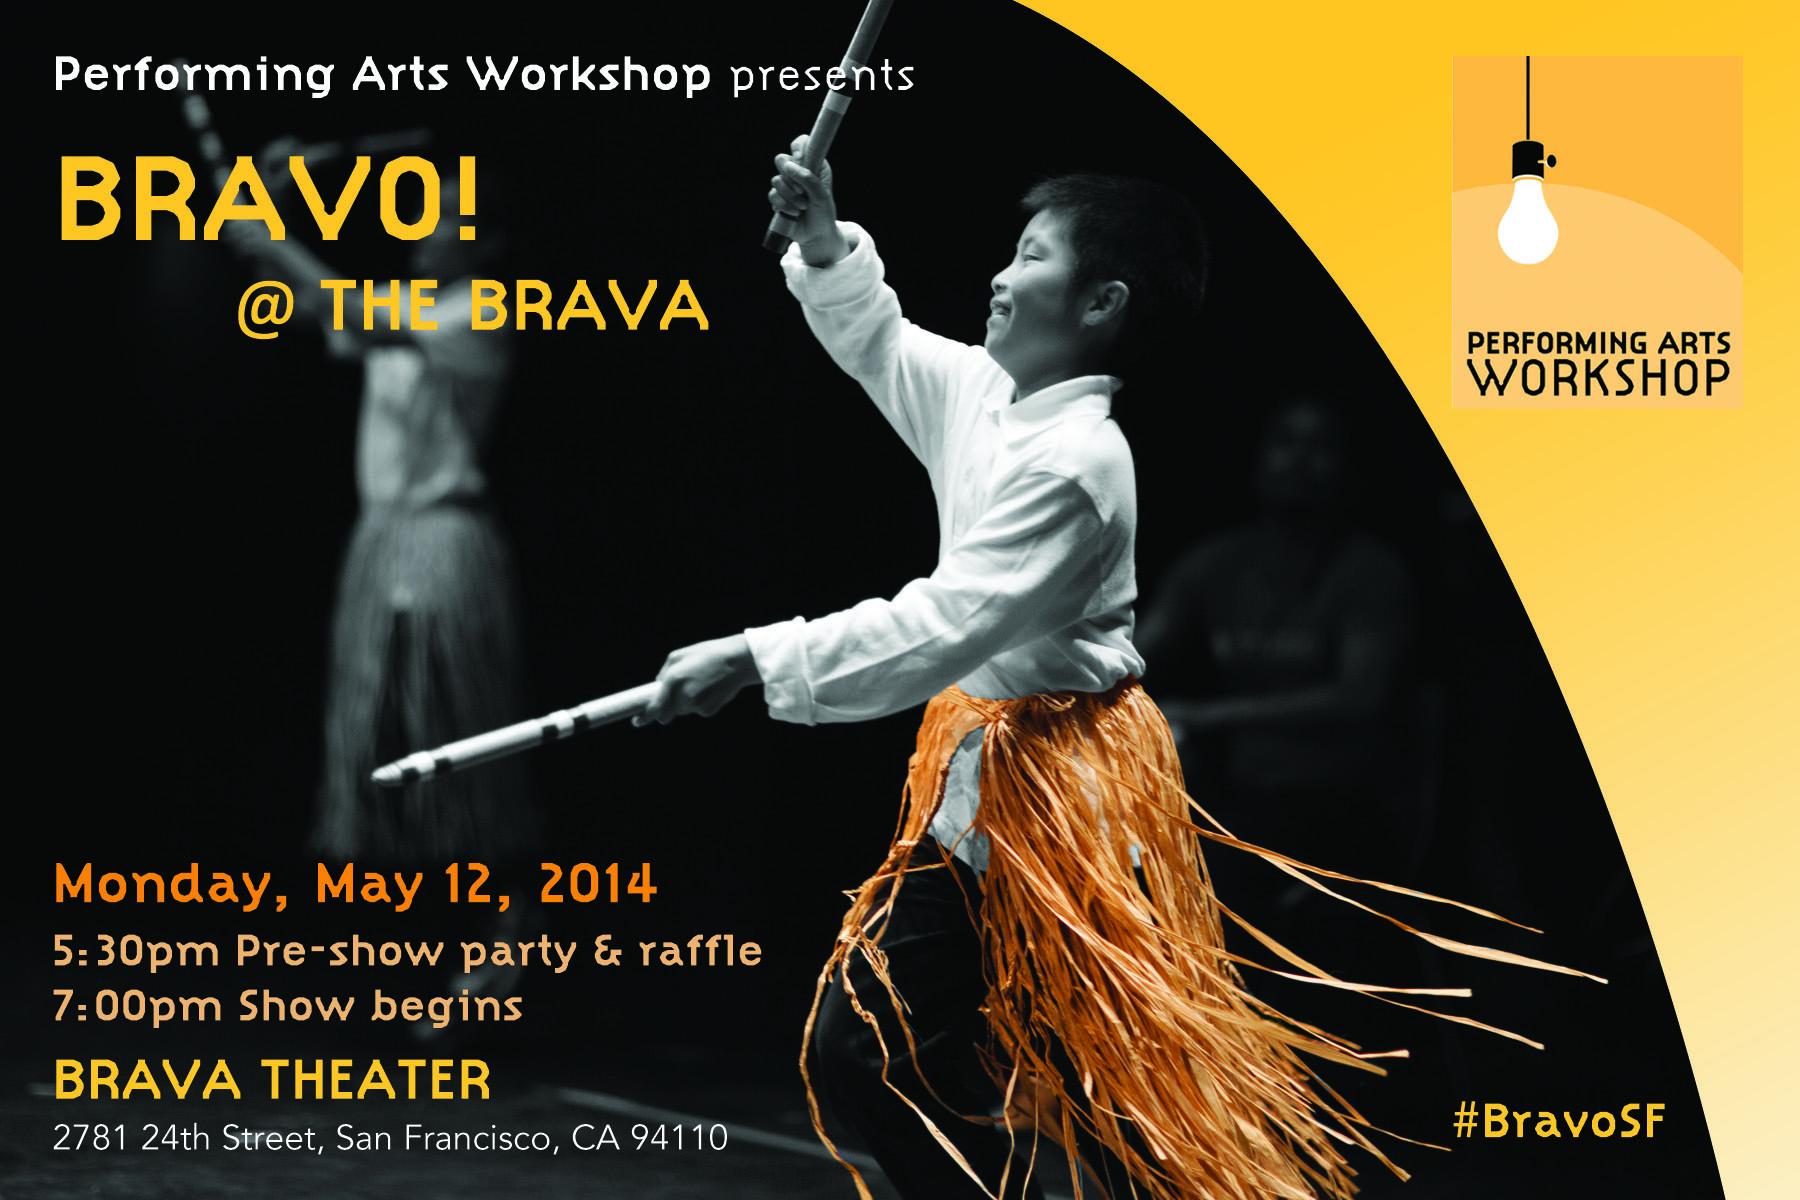 Bravo at the Brava